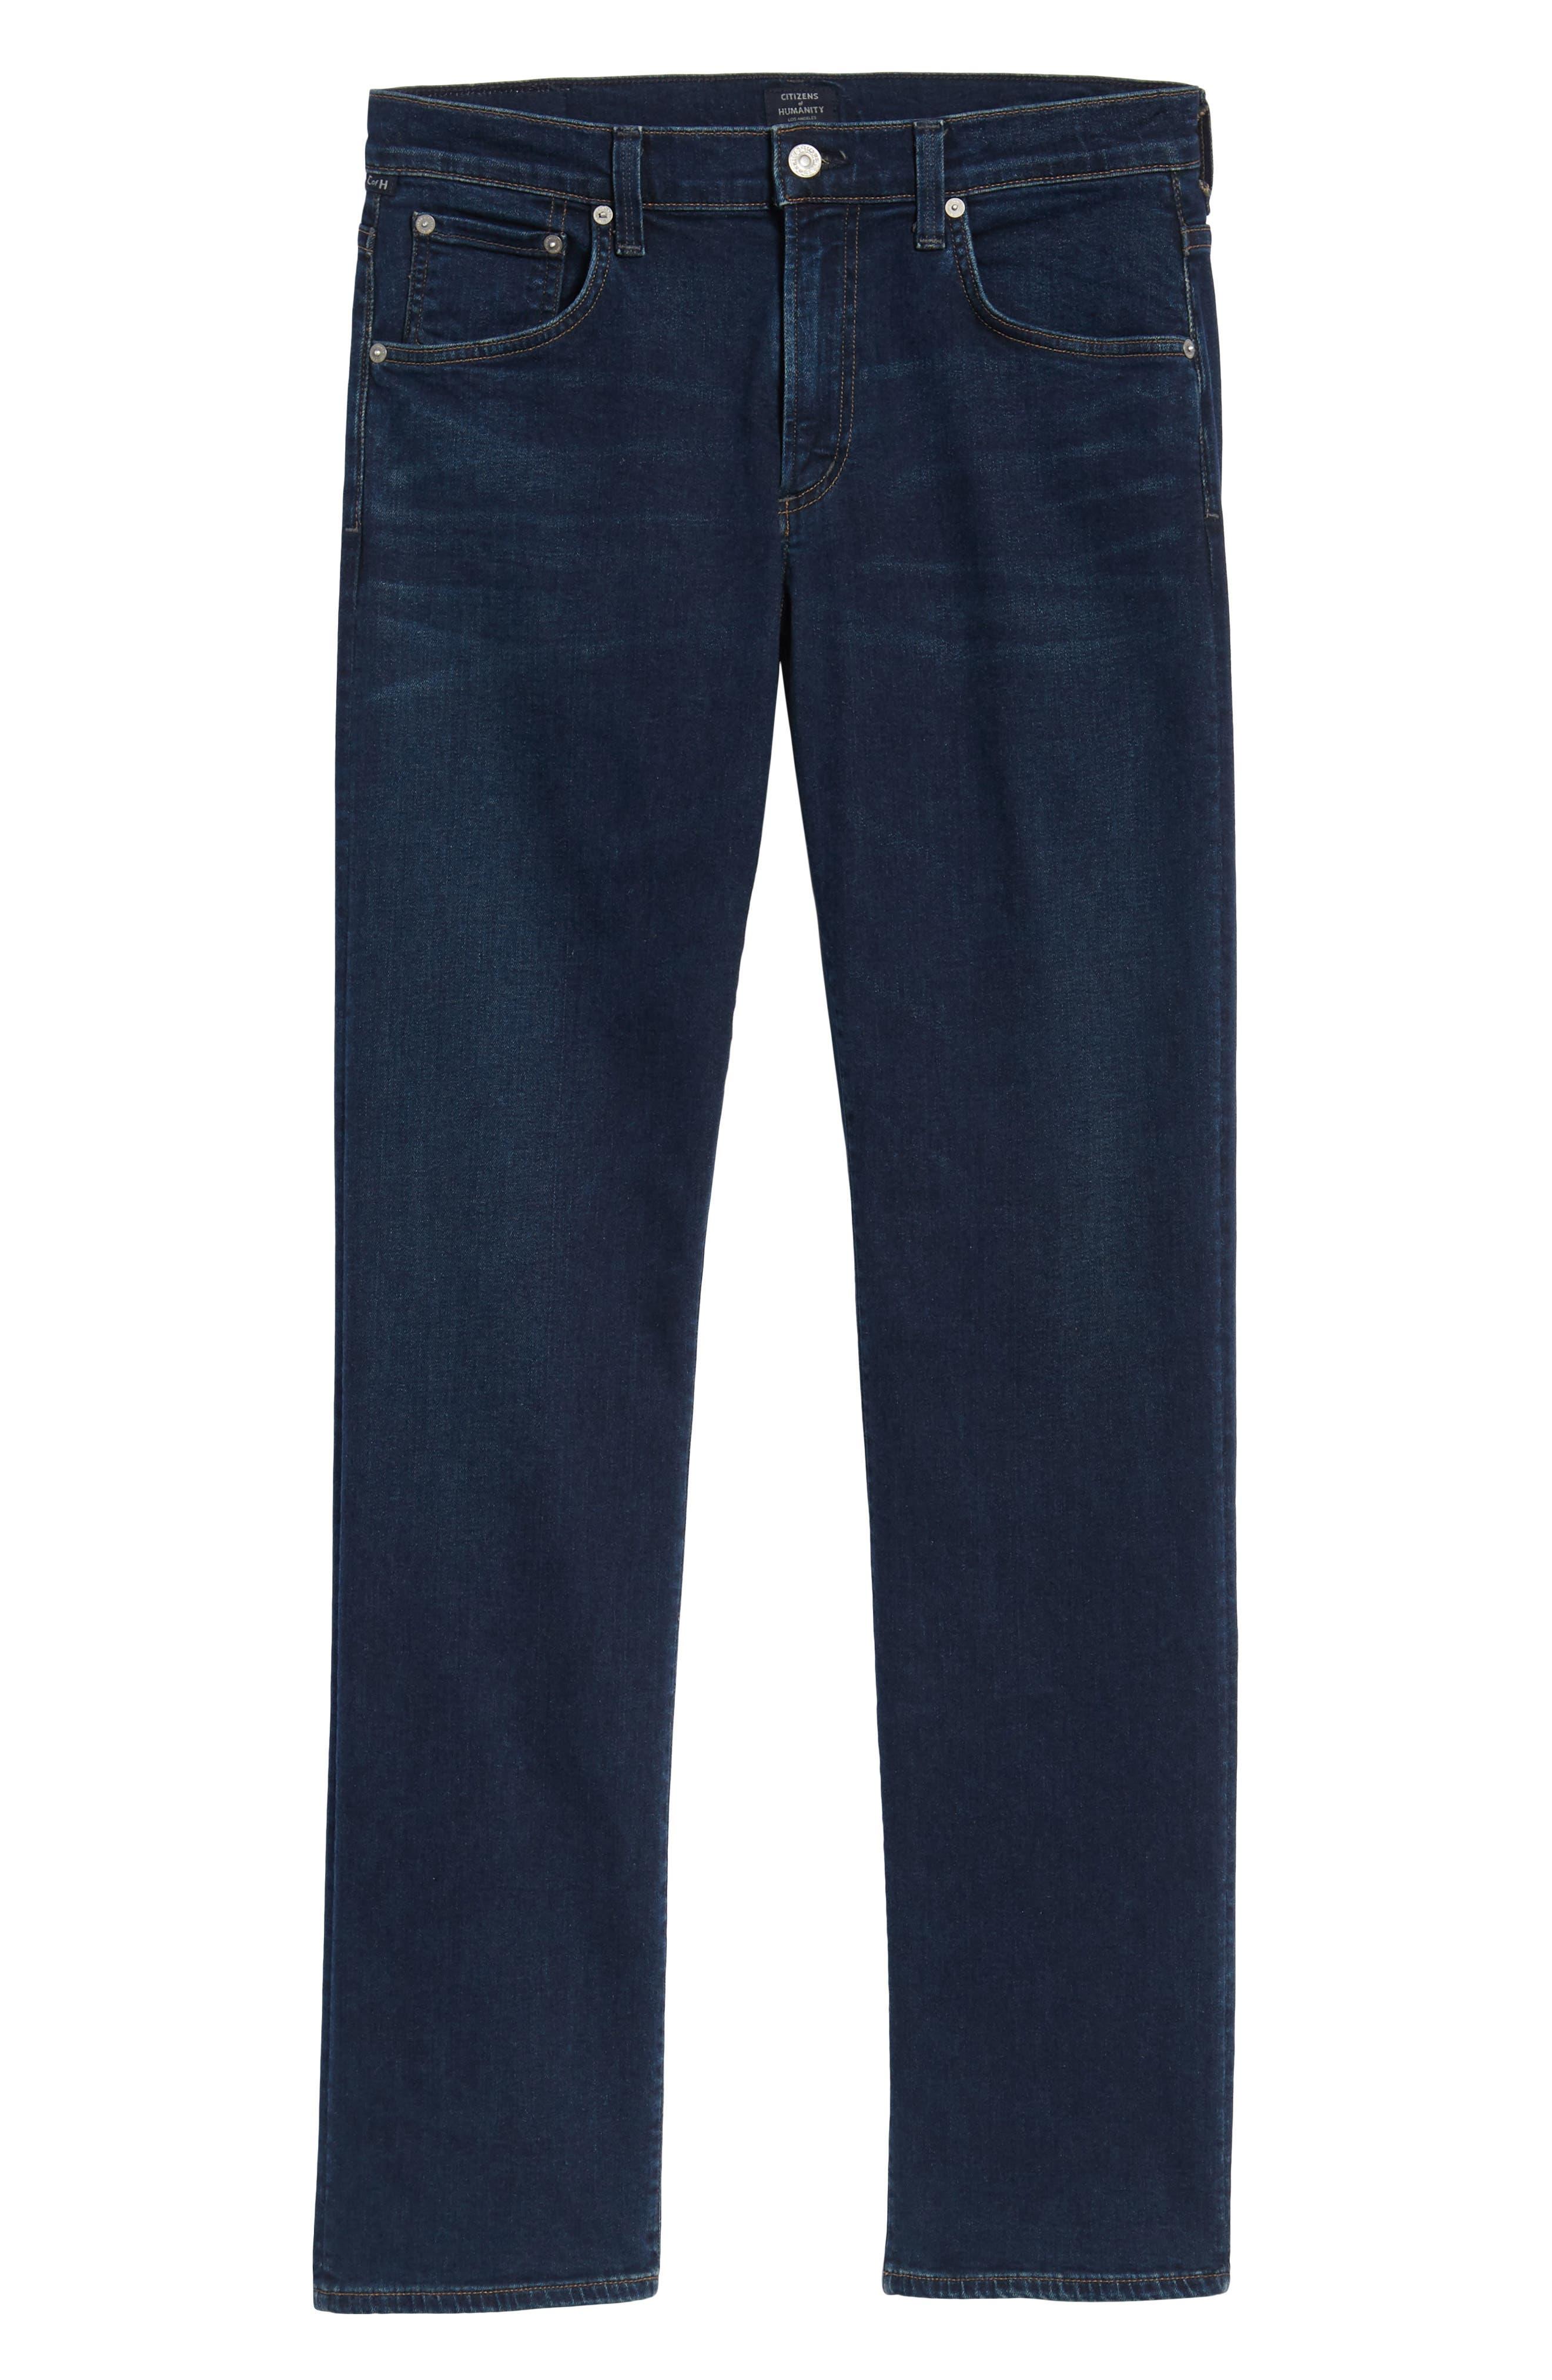 Sid Straight Leg Jeans,                             Alternate thumbnail 6, color,                             Everson